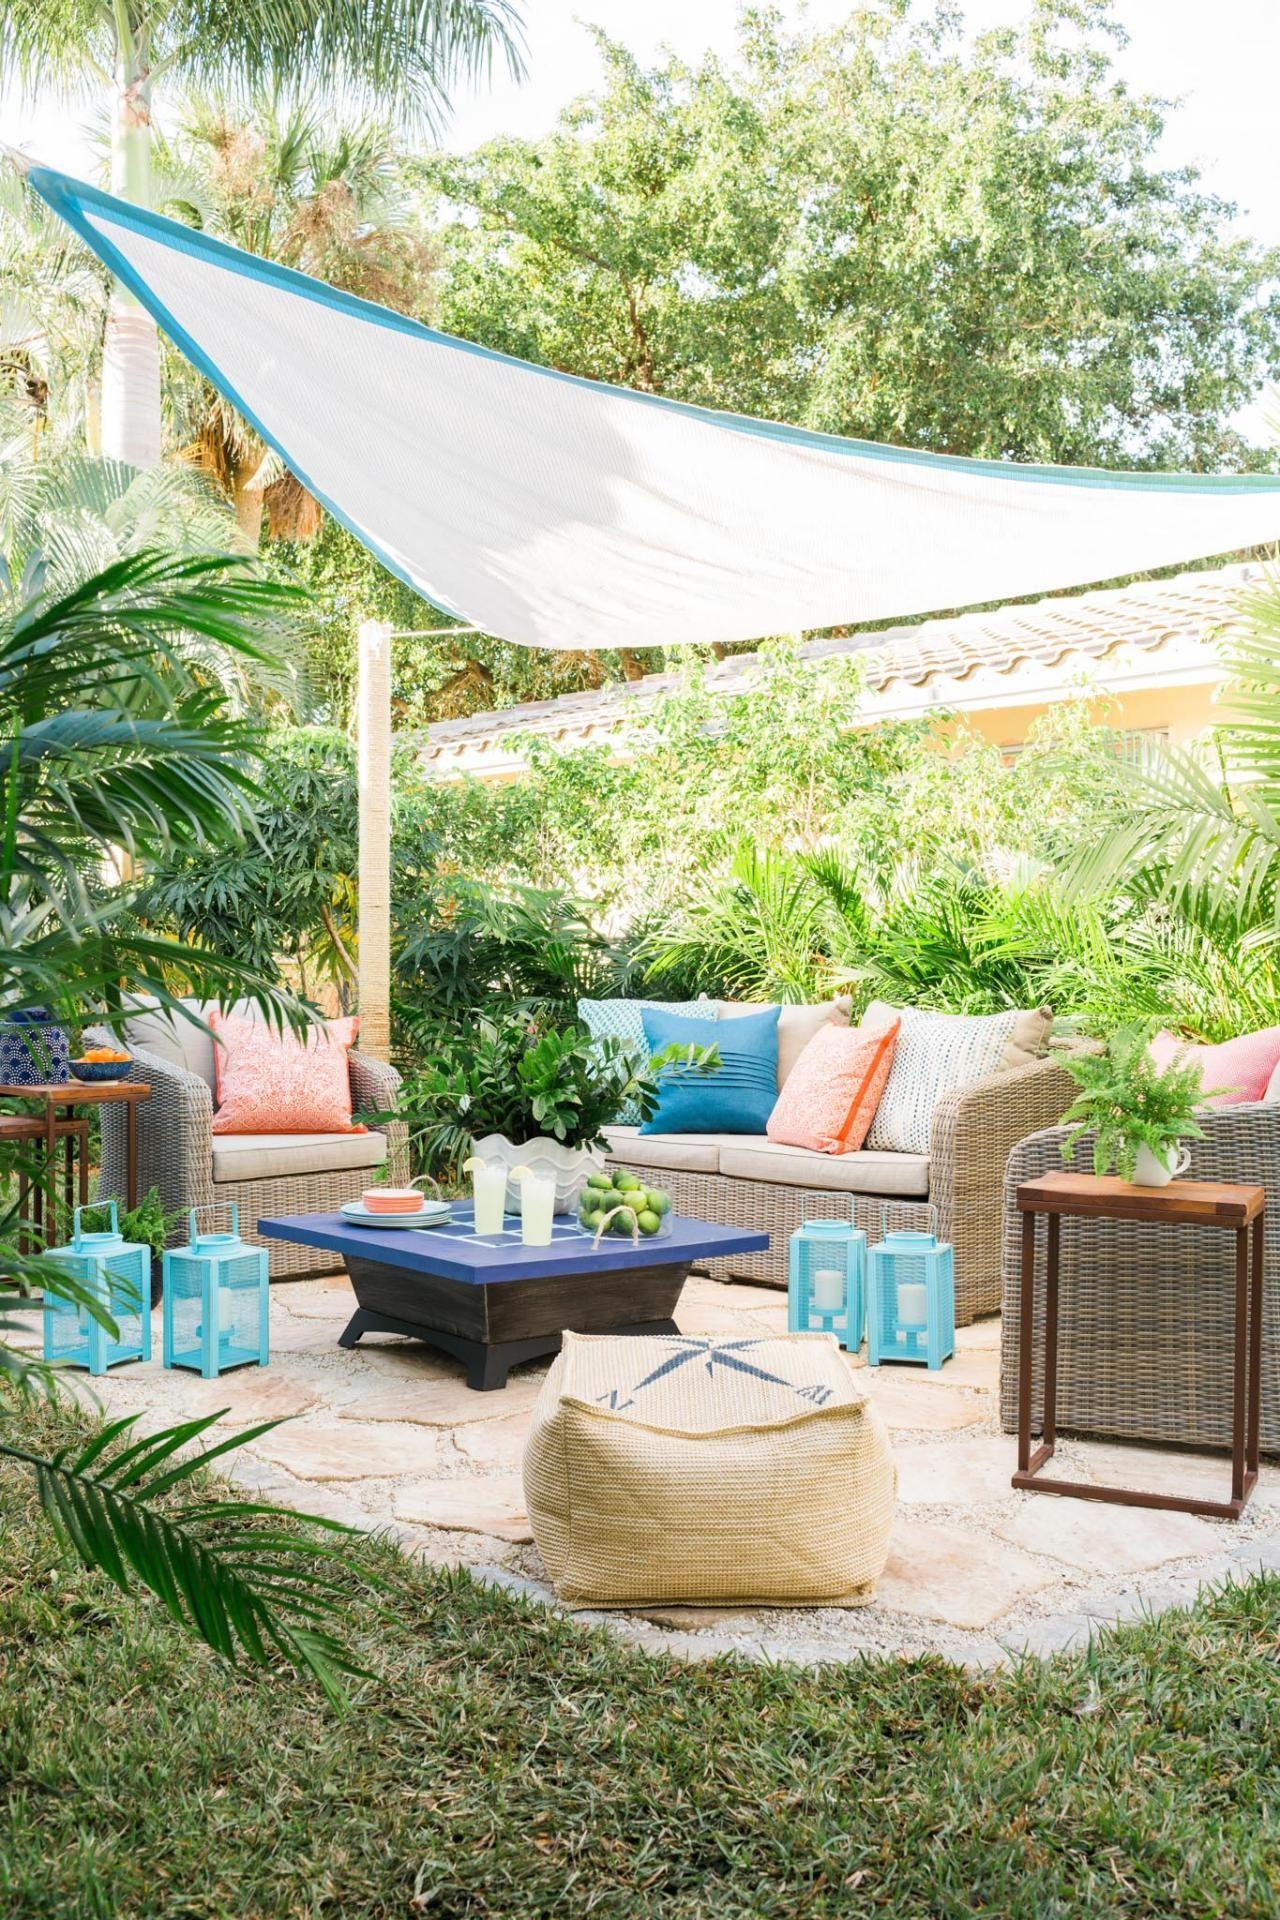 add outdoor living space with a diy paver patio back patio diy rh pinterest com